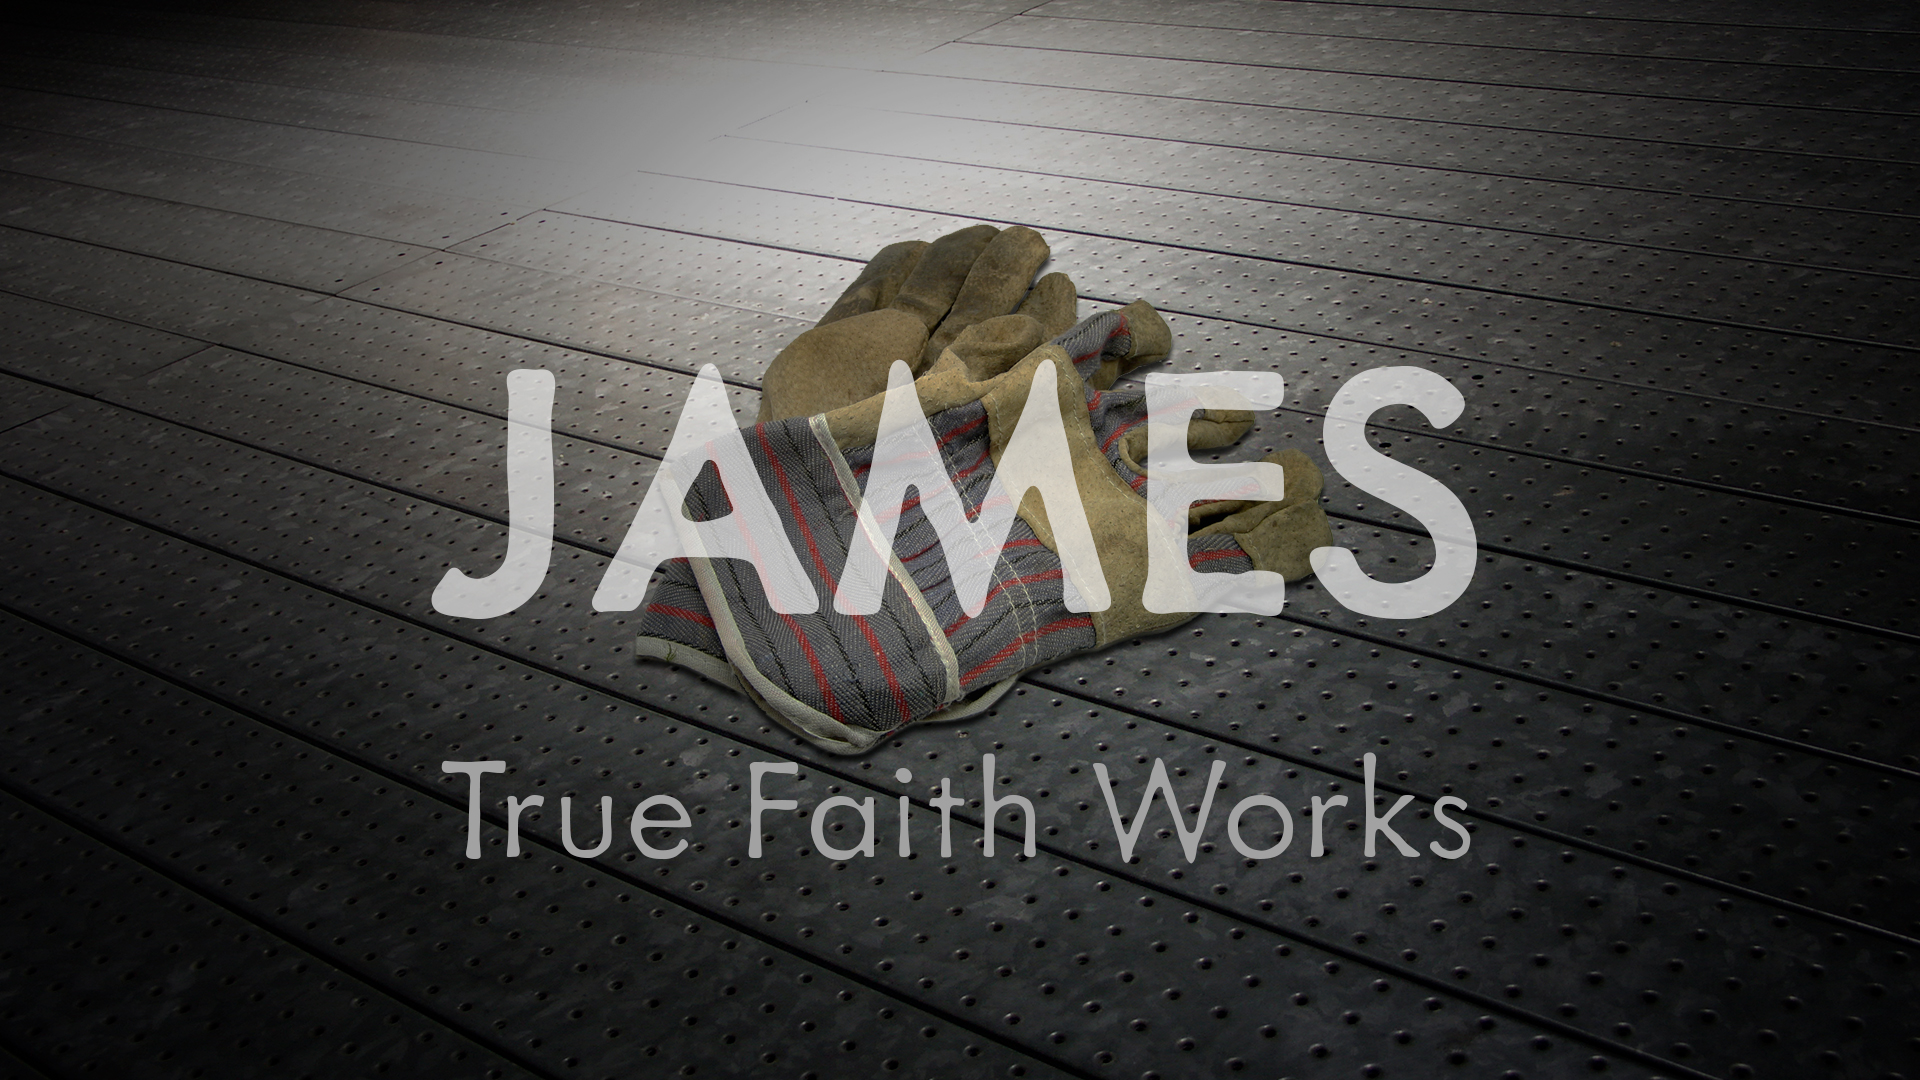 James-16x9.jpg